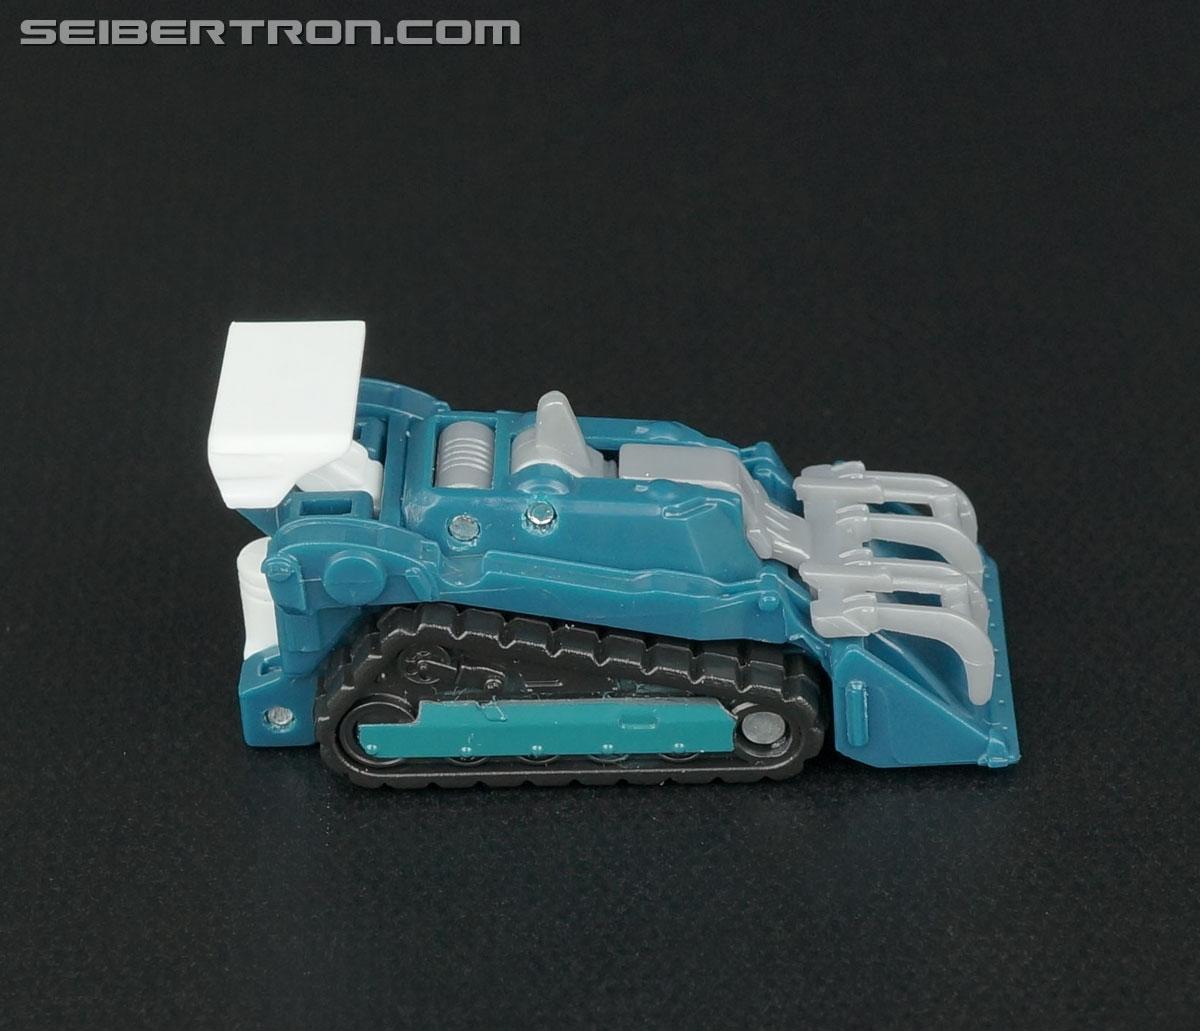 Transformers Legends Groundshaker (Image #5 of 66)